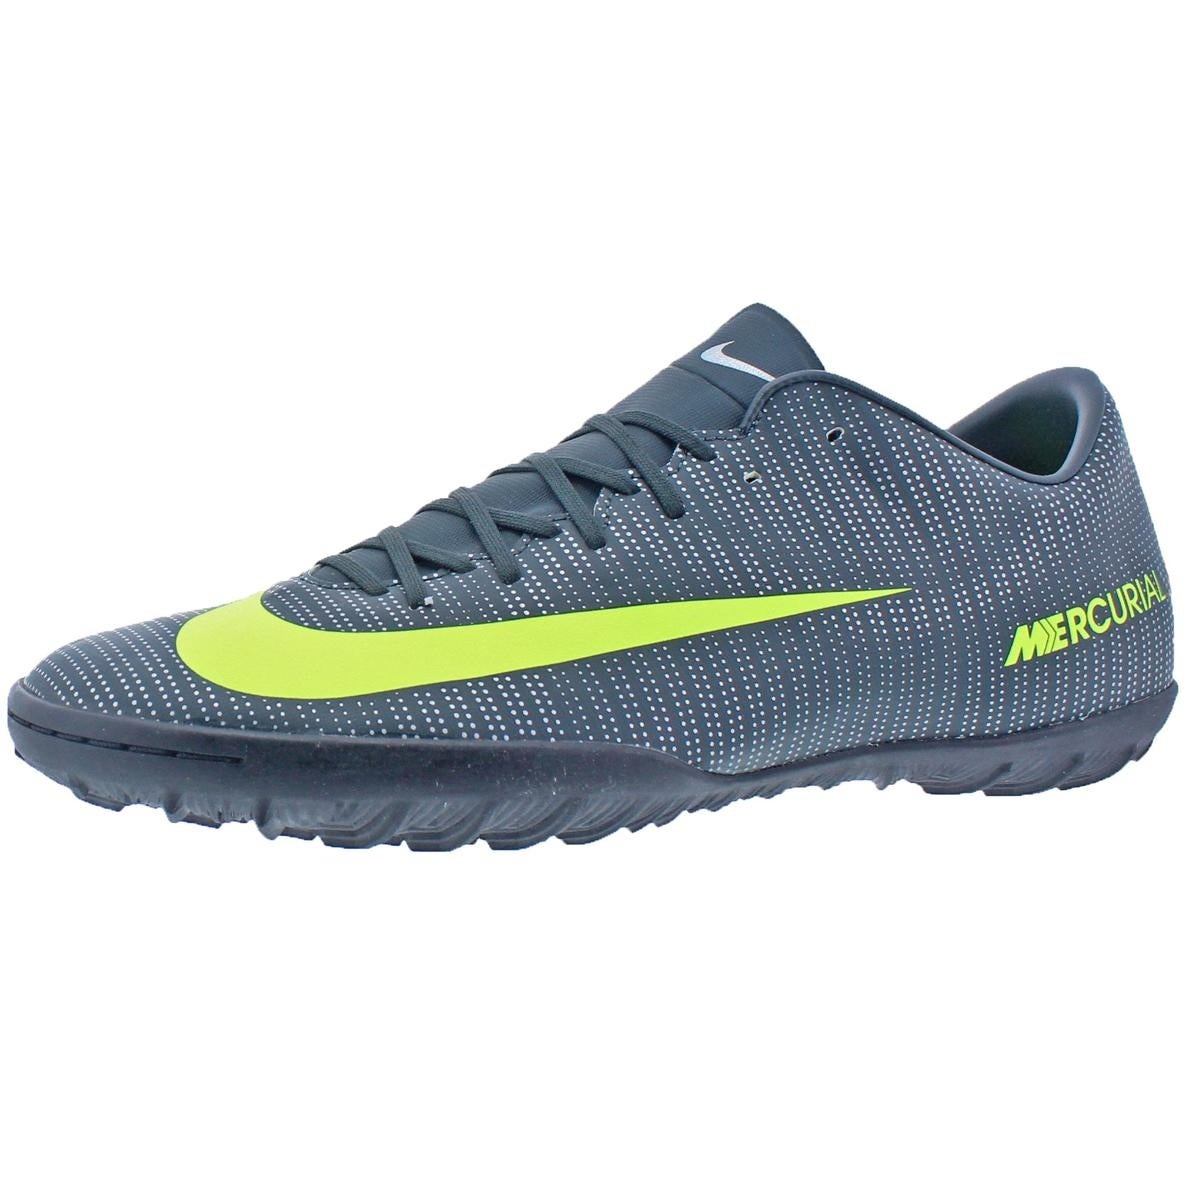 eccaea35d6c7 Shop Nike Mens Mercurialx Victory VI CR7 TF Soccer Shoes Non Marking Glitter  - 11 medium (d) - Free Shipping Today - Overstock.com - 22358930